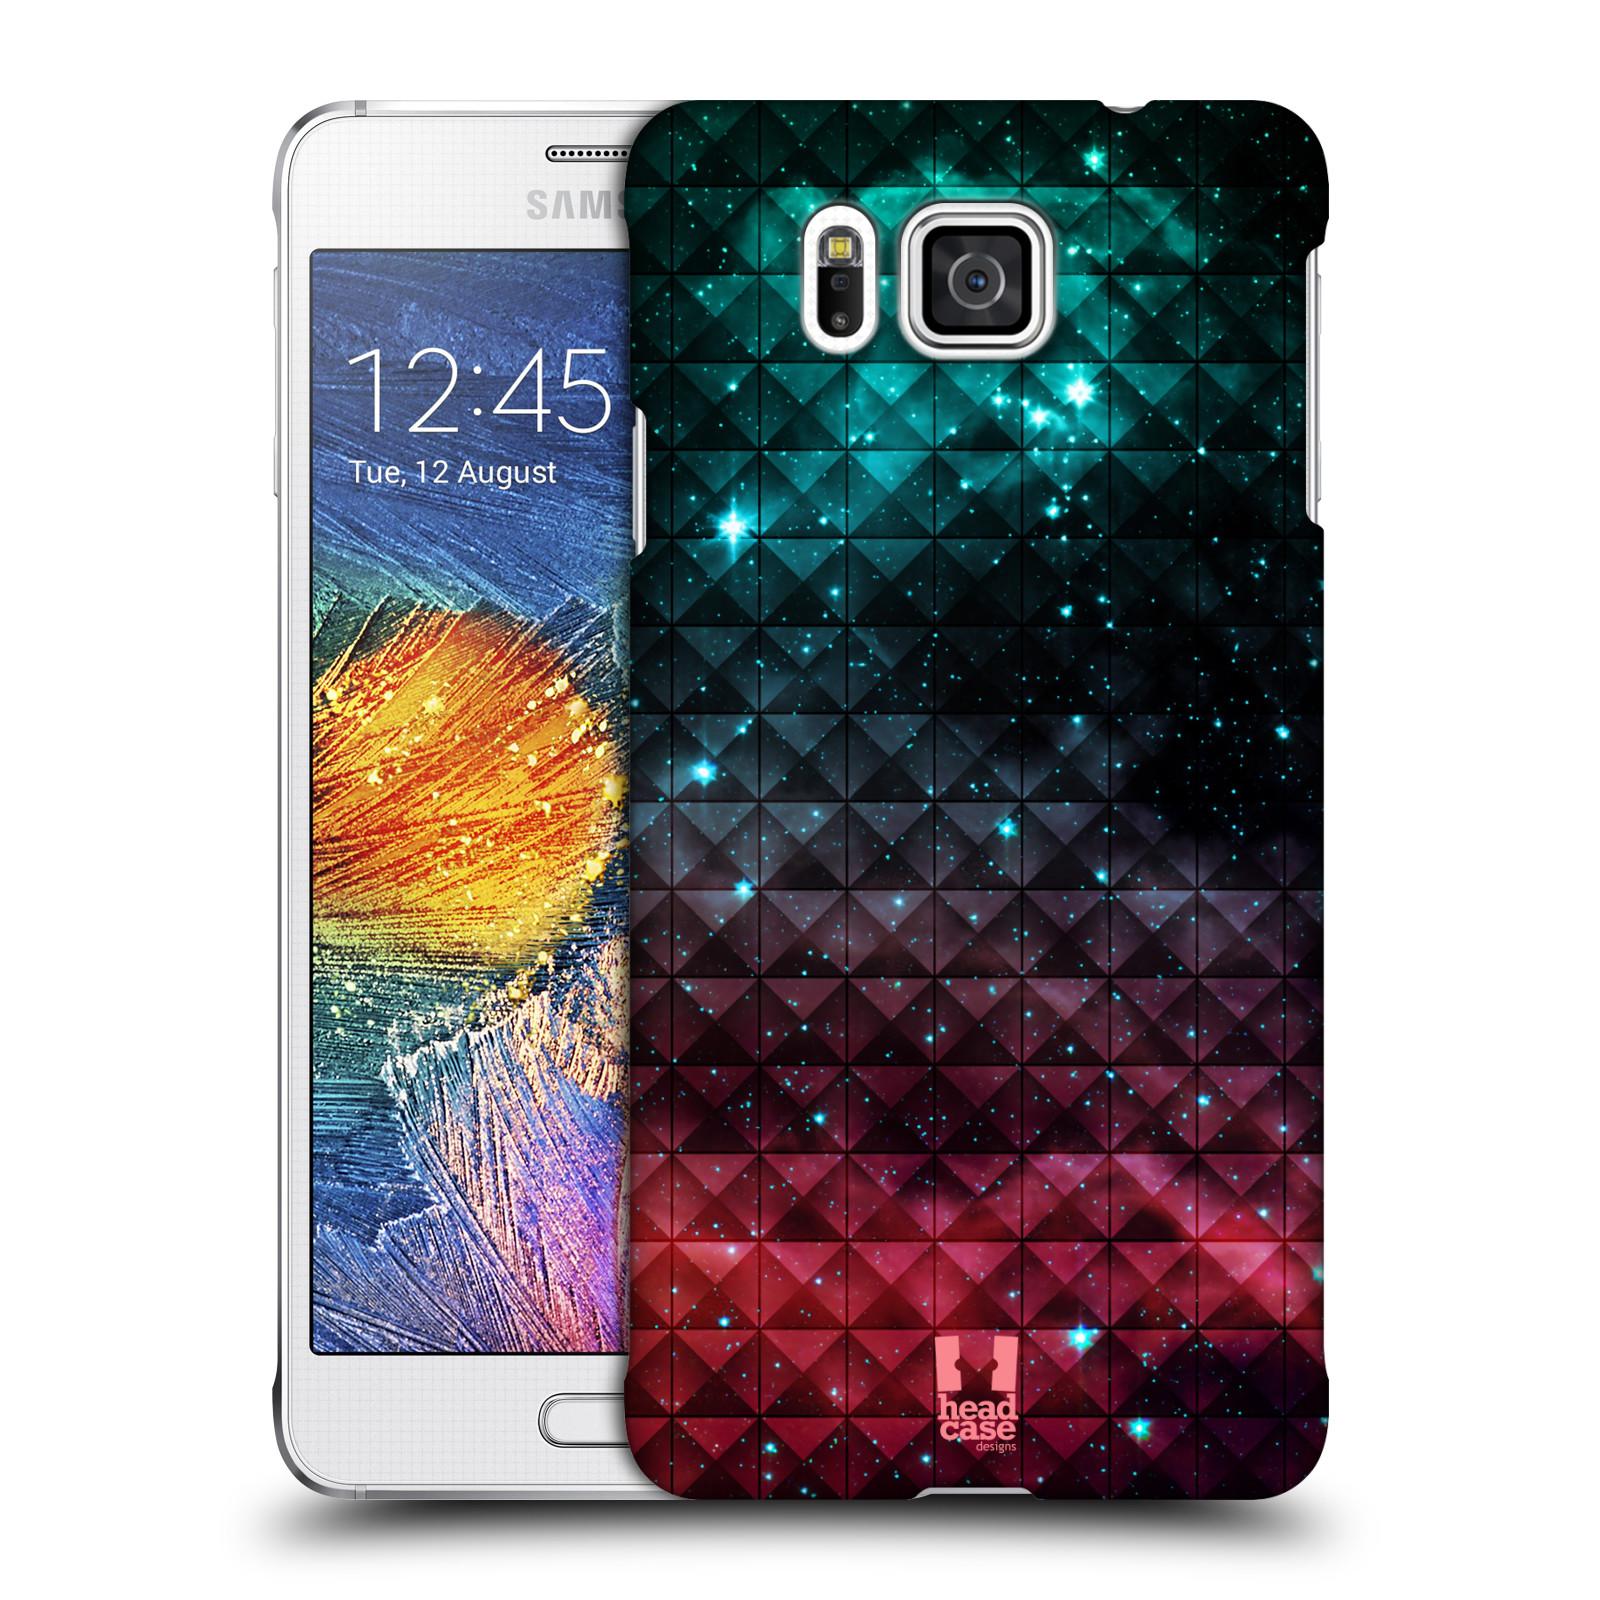 Plastové pouzdro na mobil Samsung Galaxy Alpha HEAD CASE OMBRE SPARKLE (Kryt či obal na mobilní telefon Samsung Galaxy Alpha SM-G850)